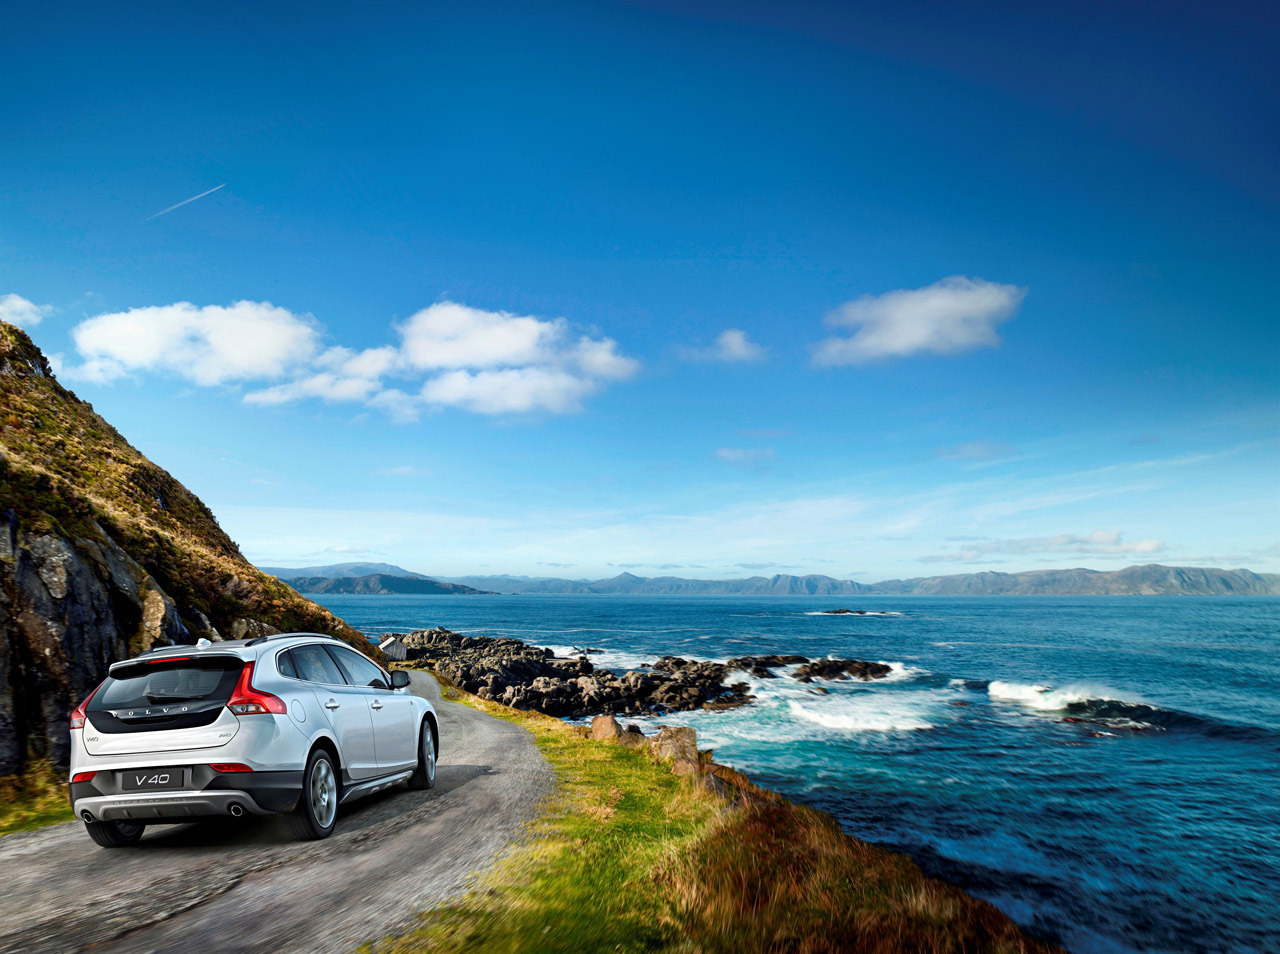 Volvo V70 XC70 Ocean Race 2014 03